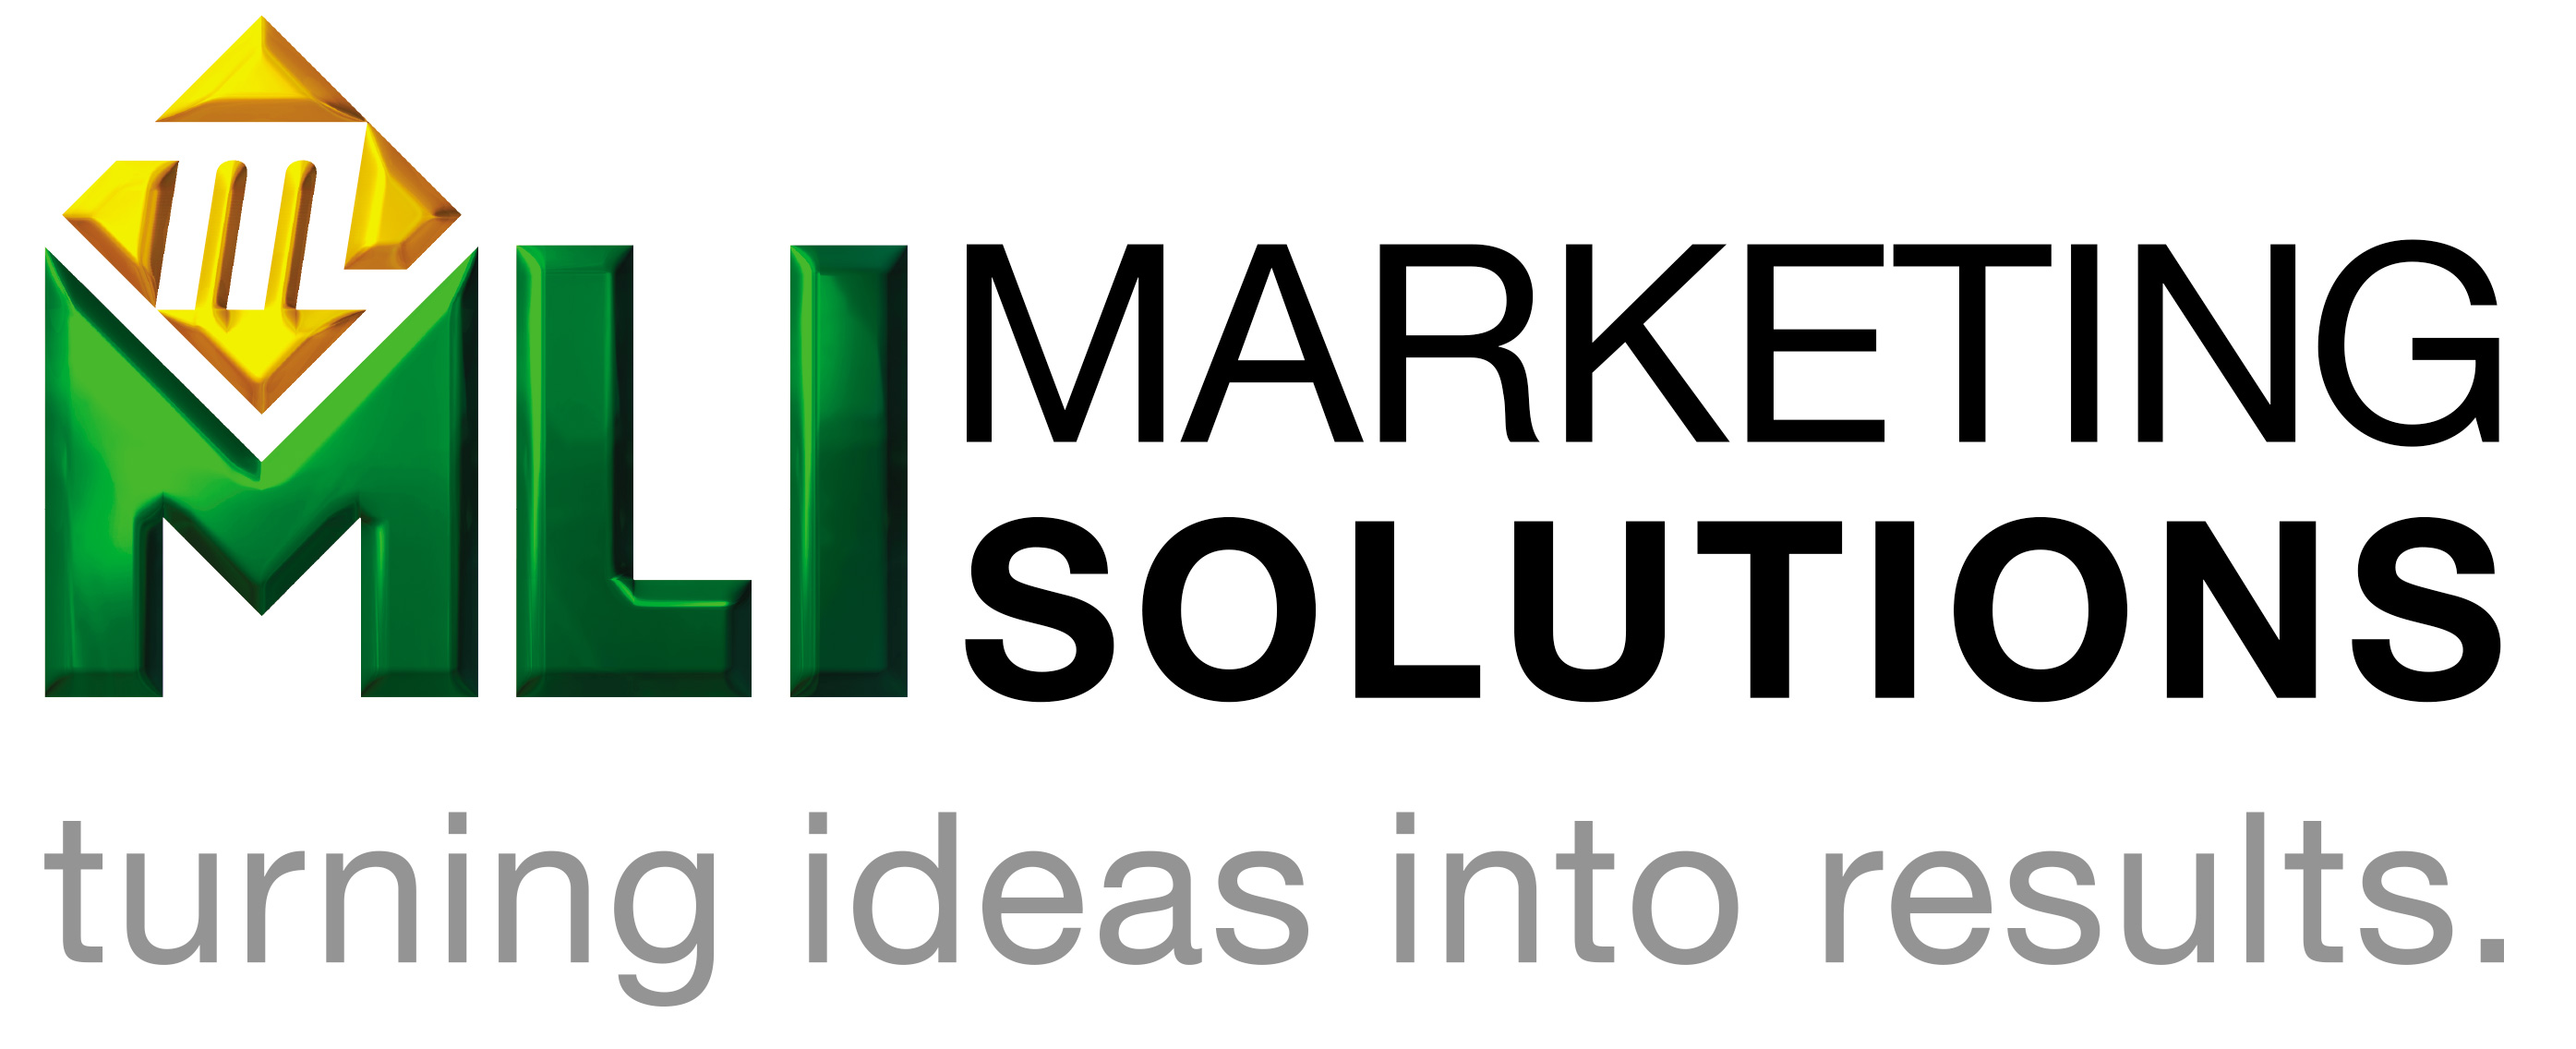 MLI Marketing Solutions